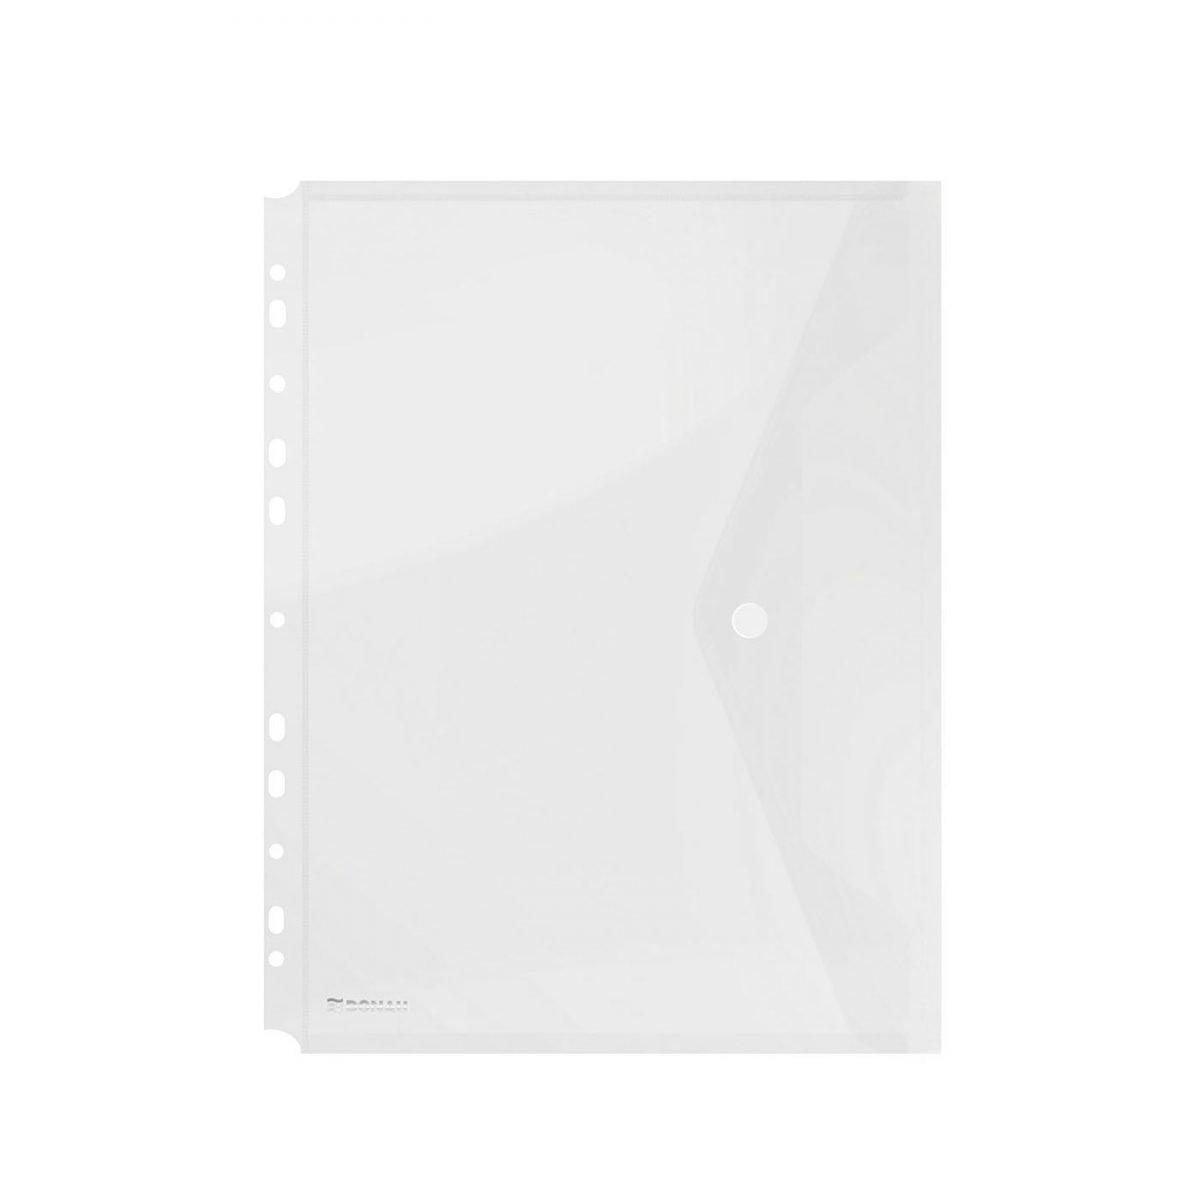 Folie protectie doc. A4 portret, inchidere cu capsa, 4/set, 200 microni, DONAU - transparent